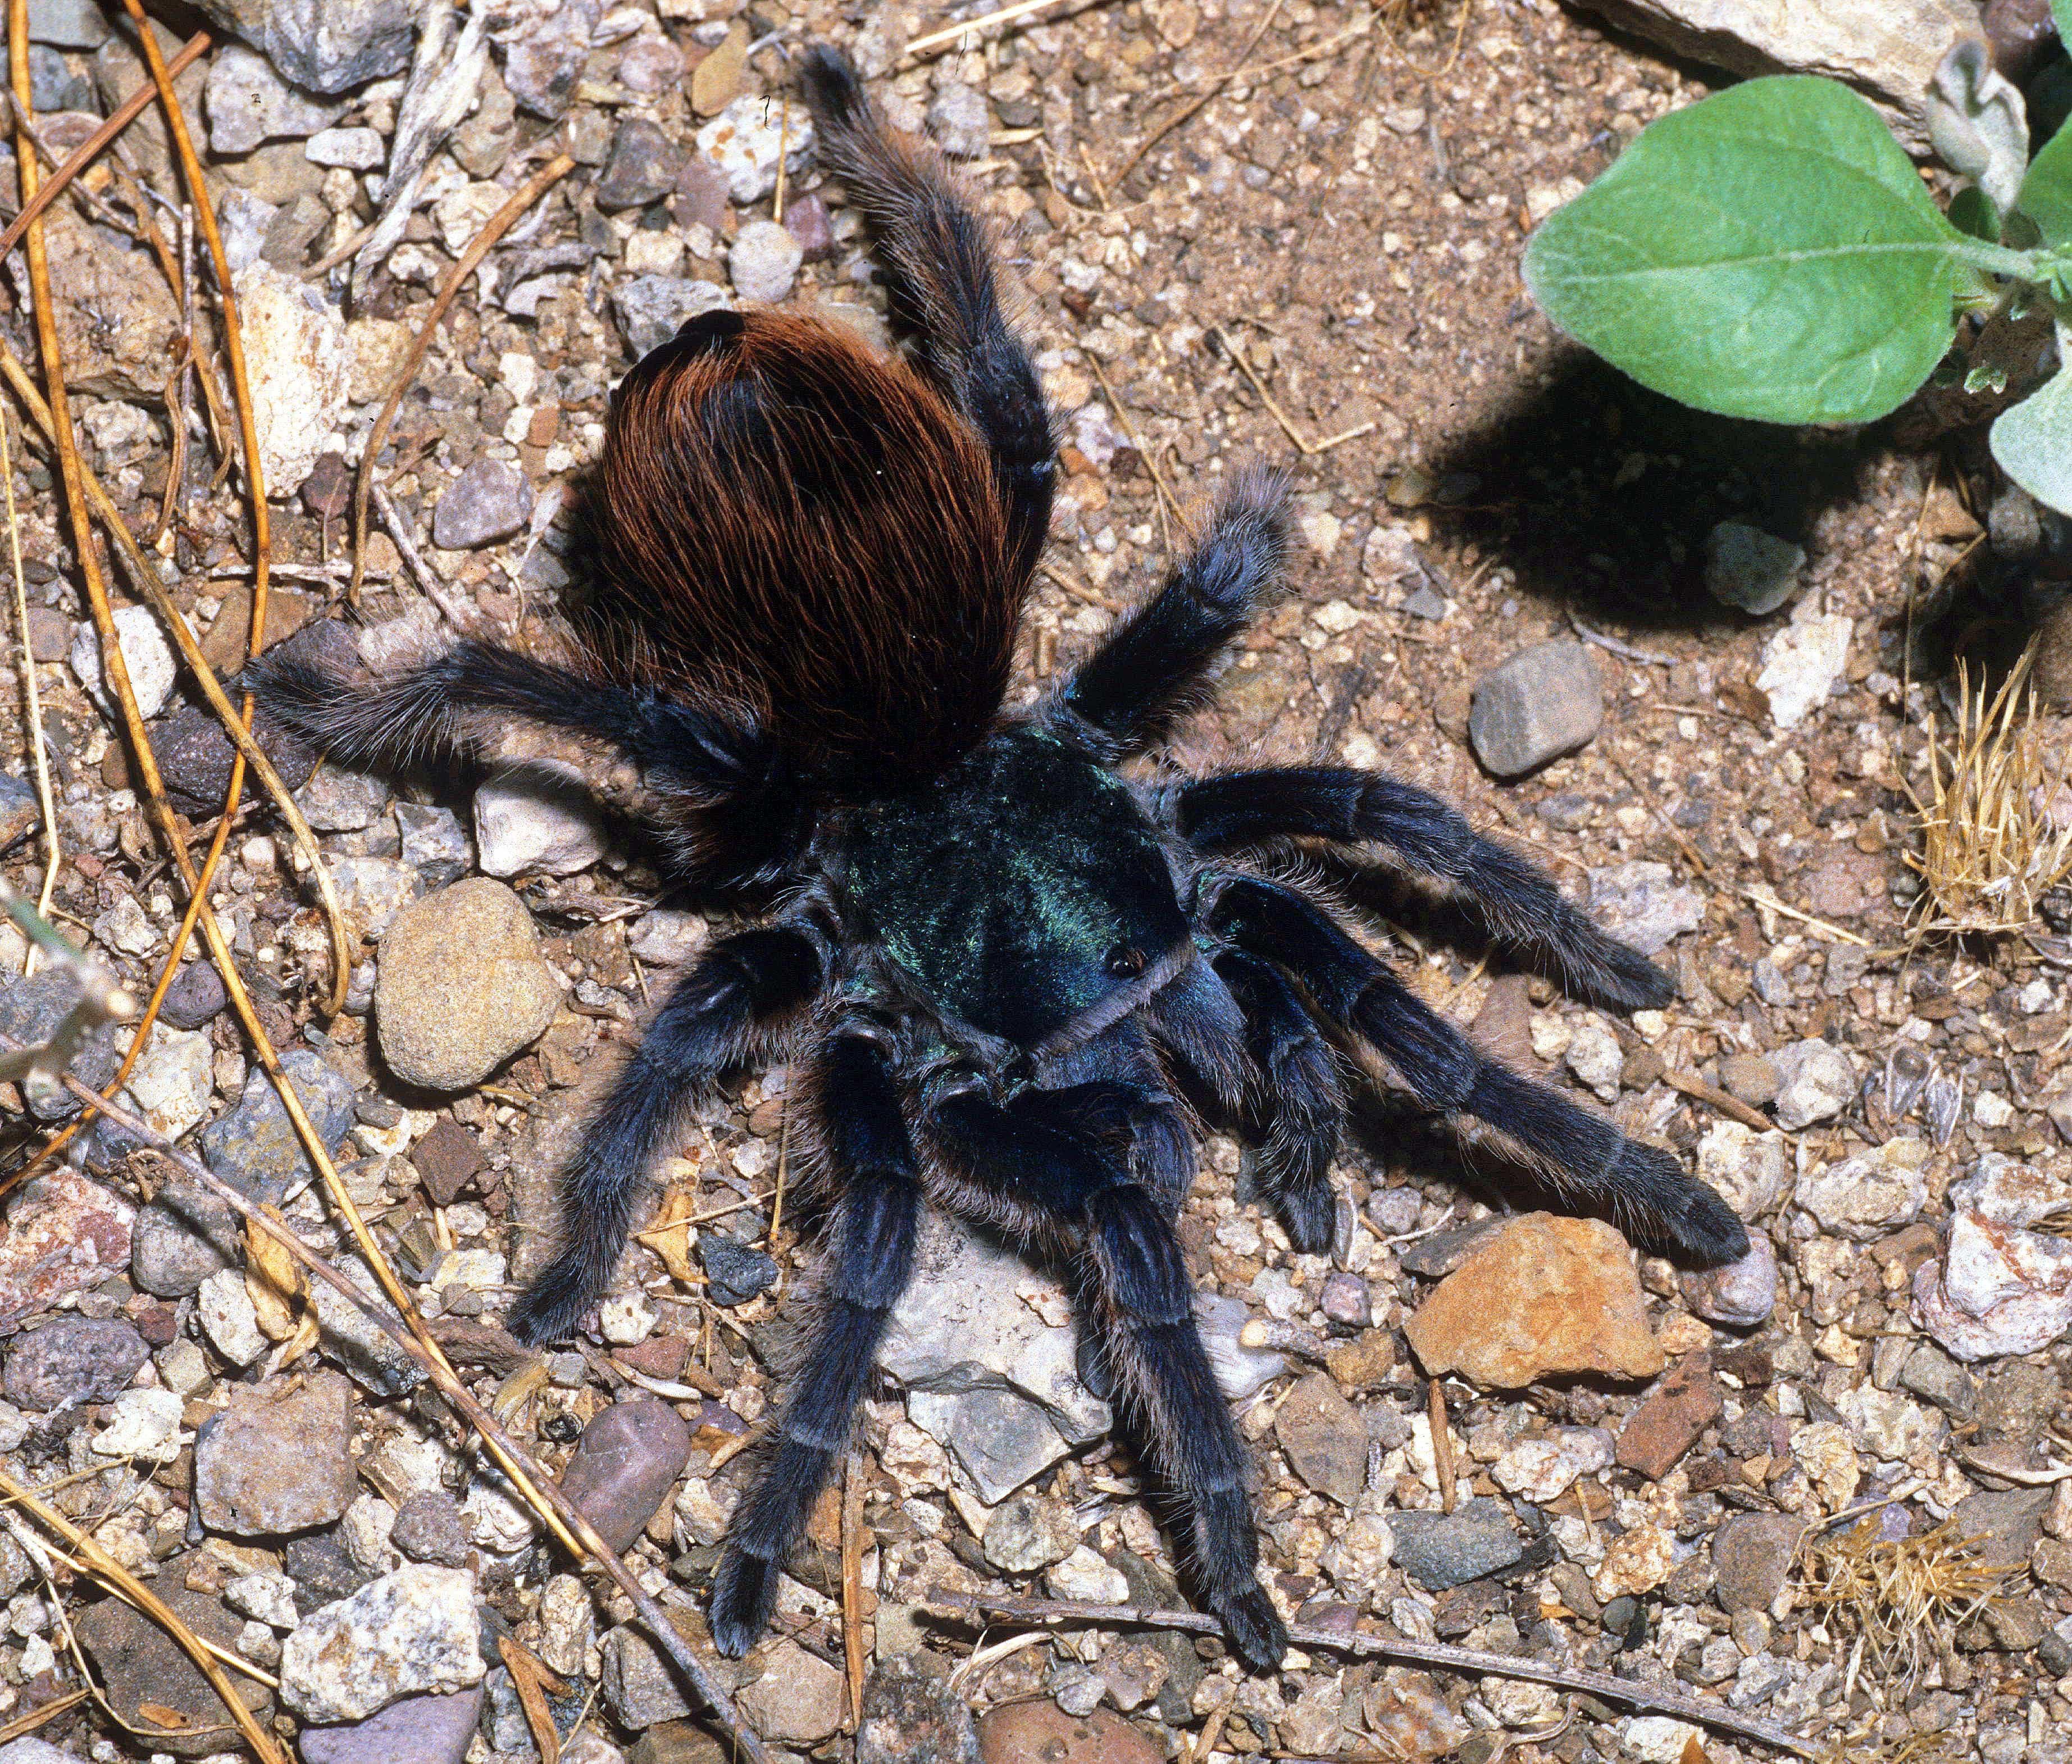 Picture of Aphonopelma mooreae (North American Cobalt Tarantula) - Female - Dorsal